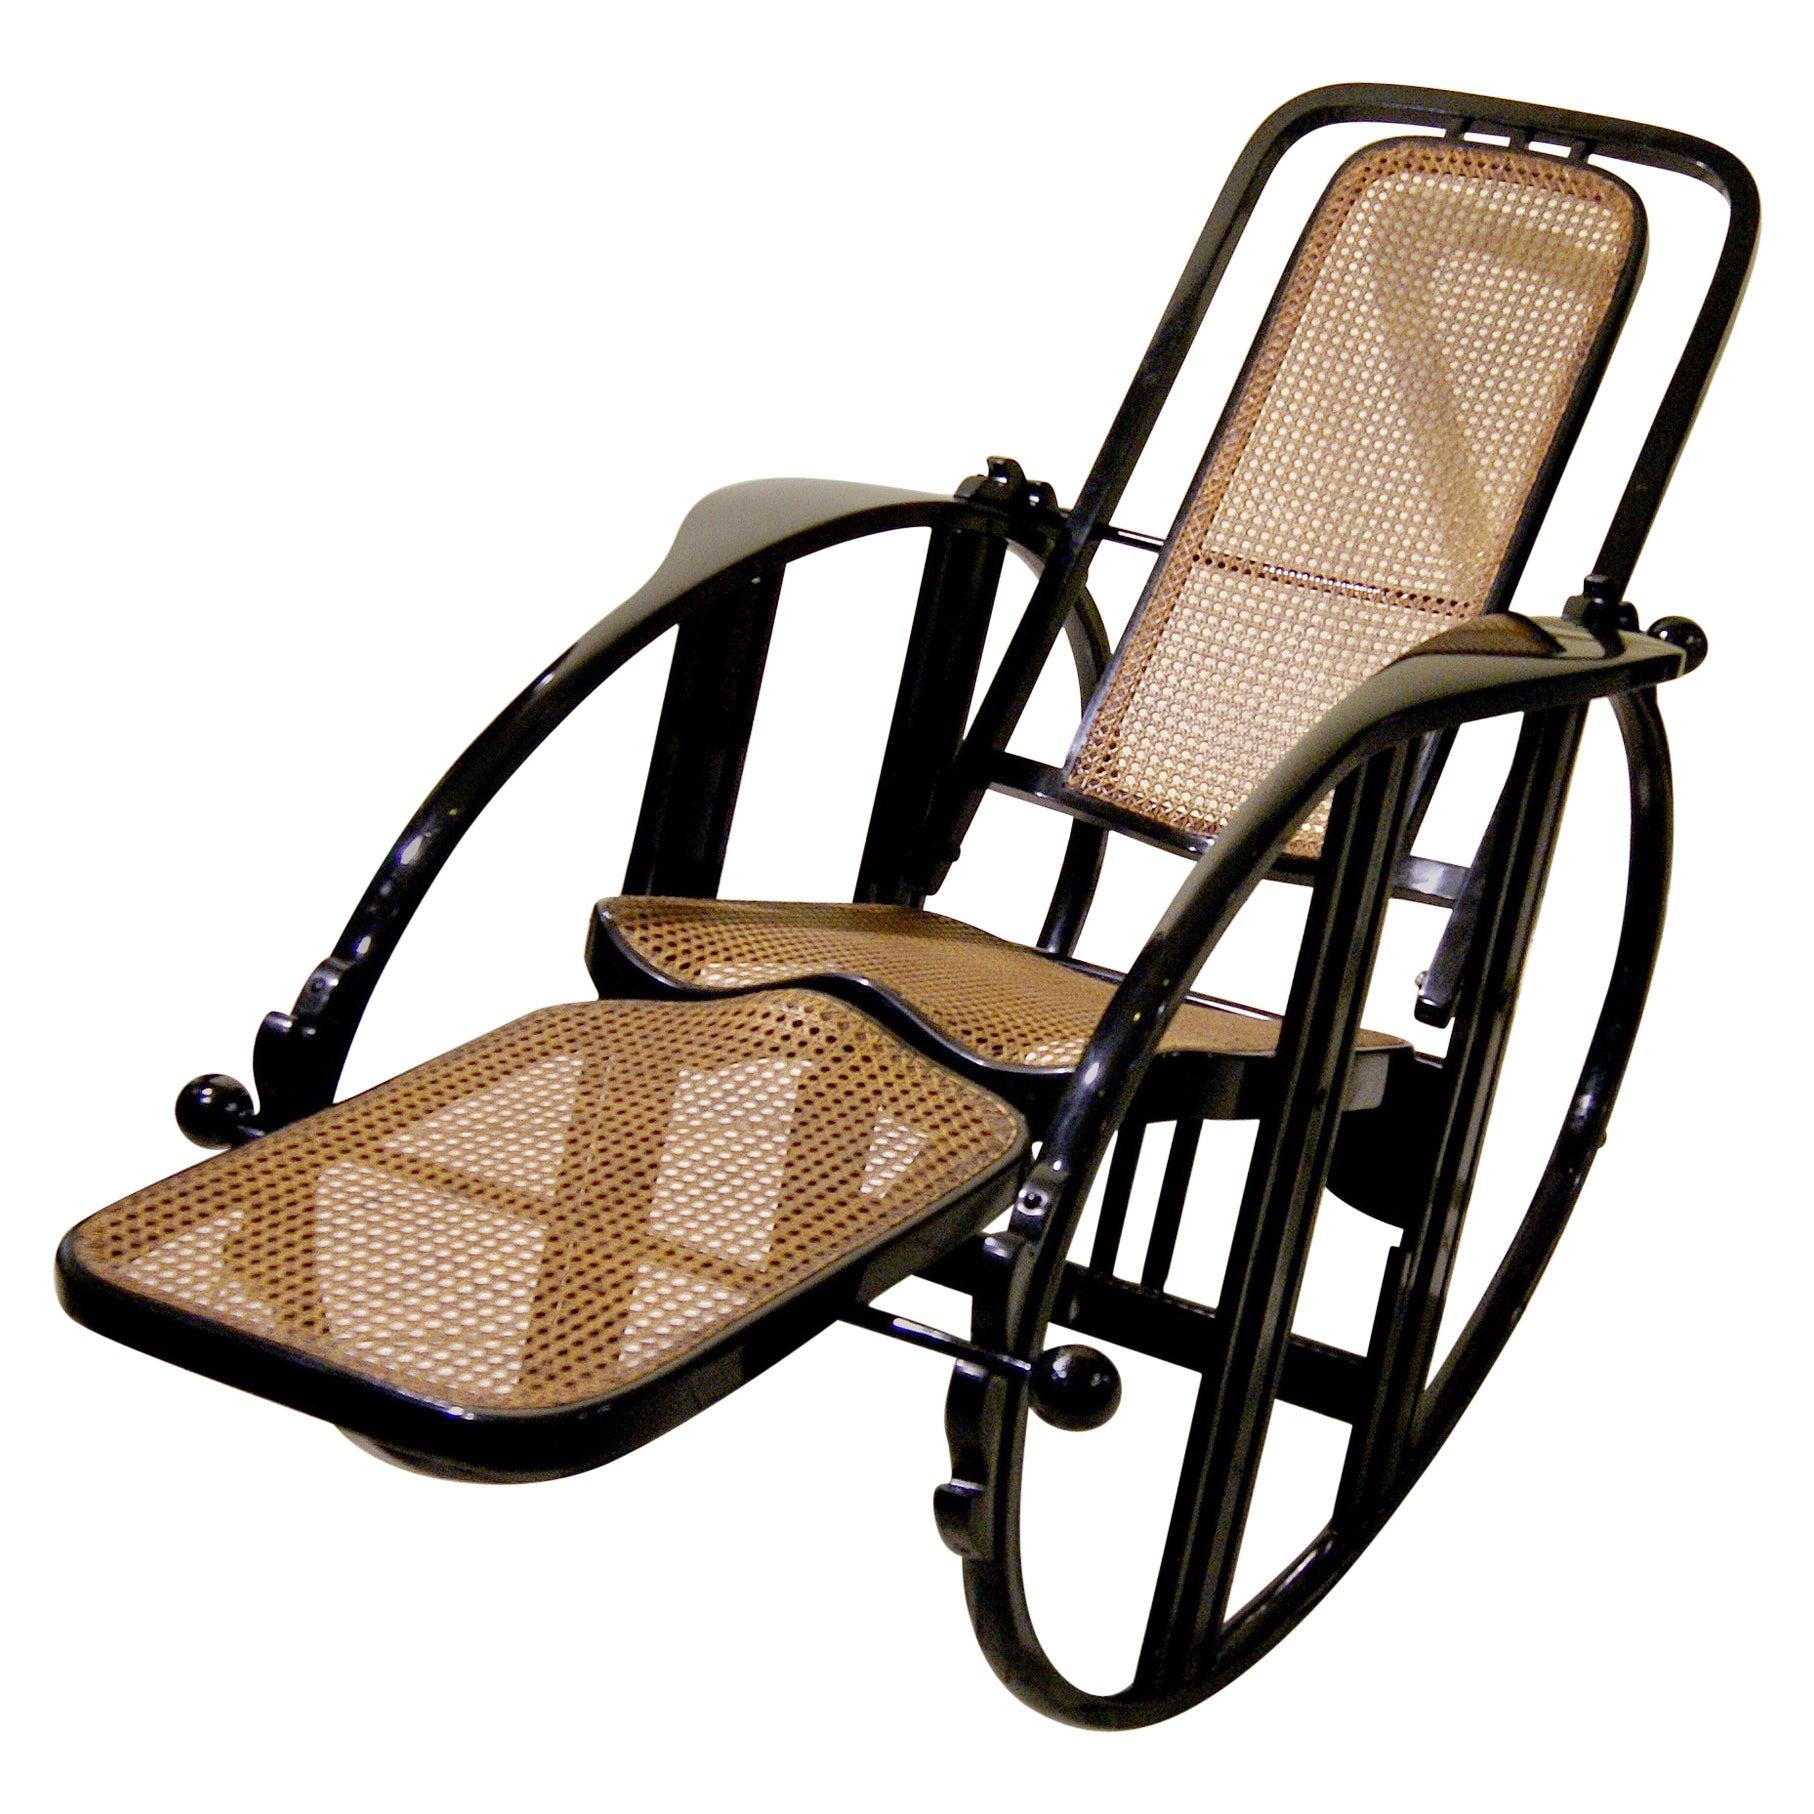 black rocking chairs electric bath elderly antonio volpe udine josef hoffmann attr egg chair circa 1922 at 1stdibs